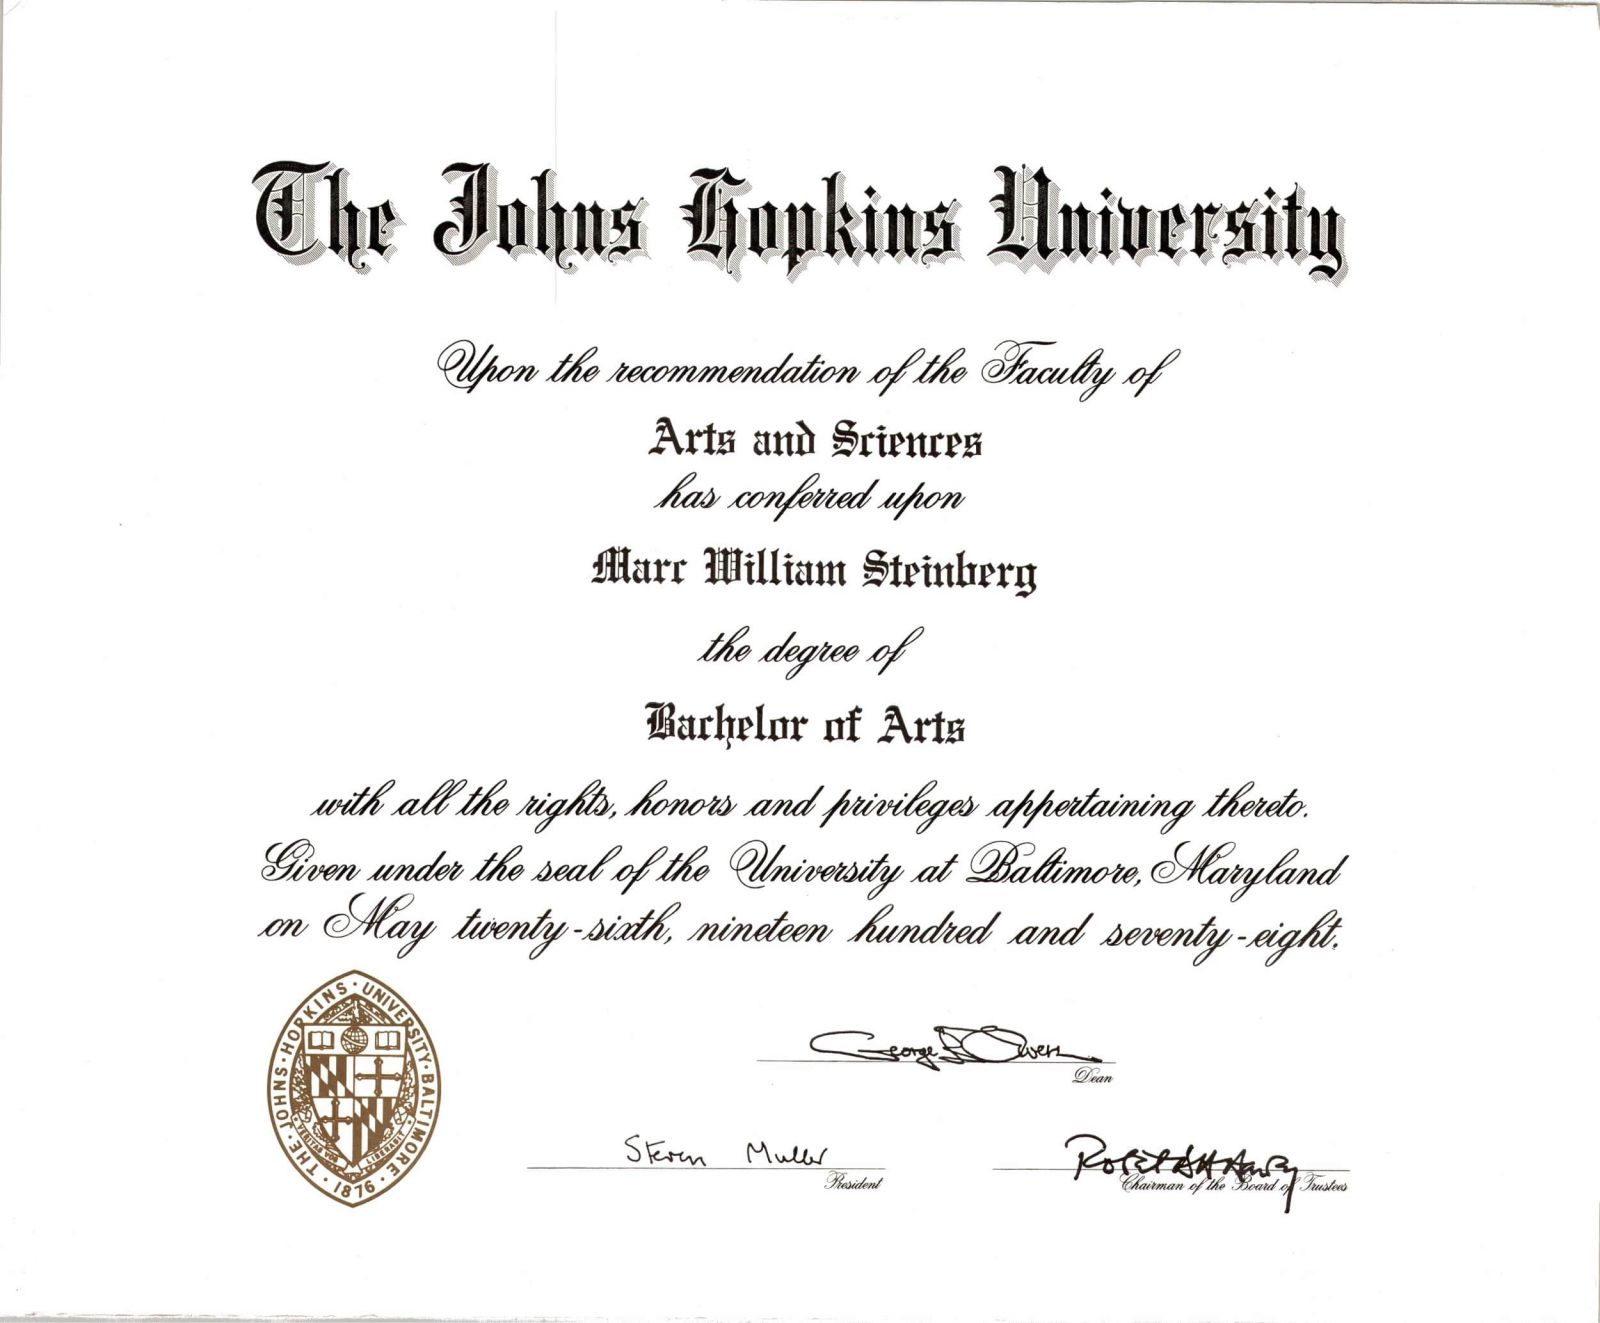 1_johnshopkins-2diplomasplus_page_2-2500×2067-2-min